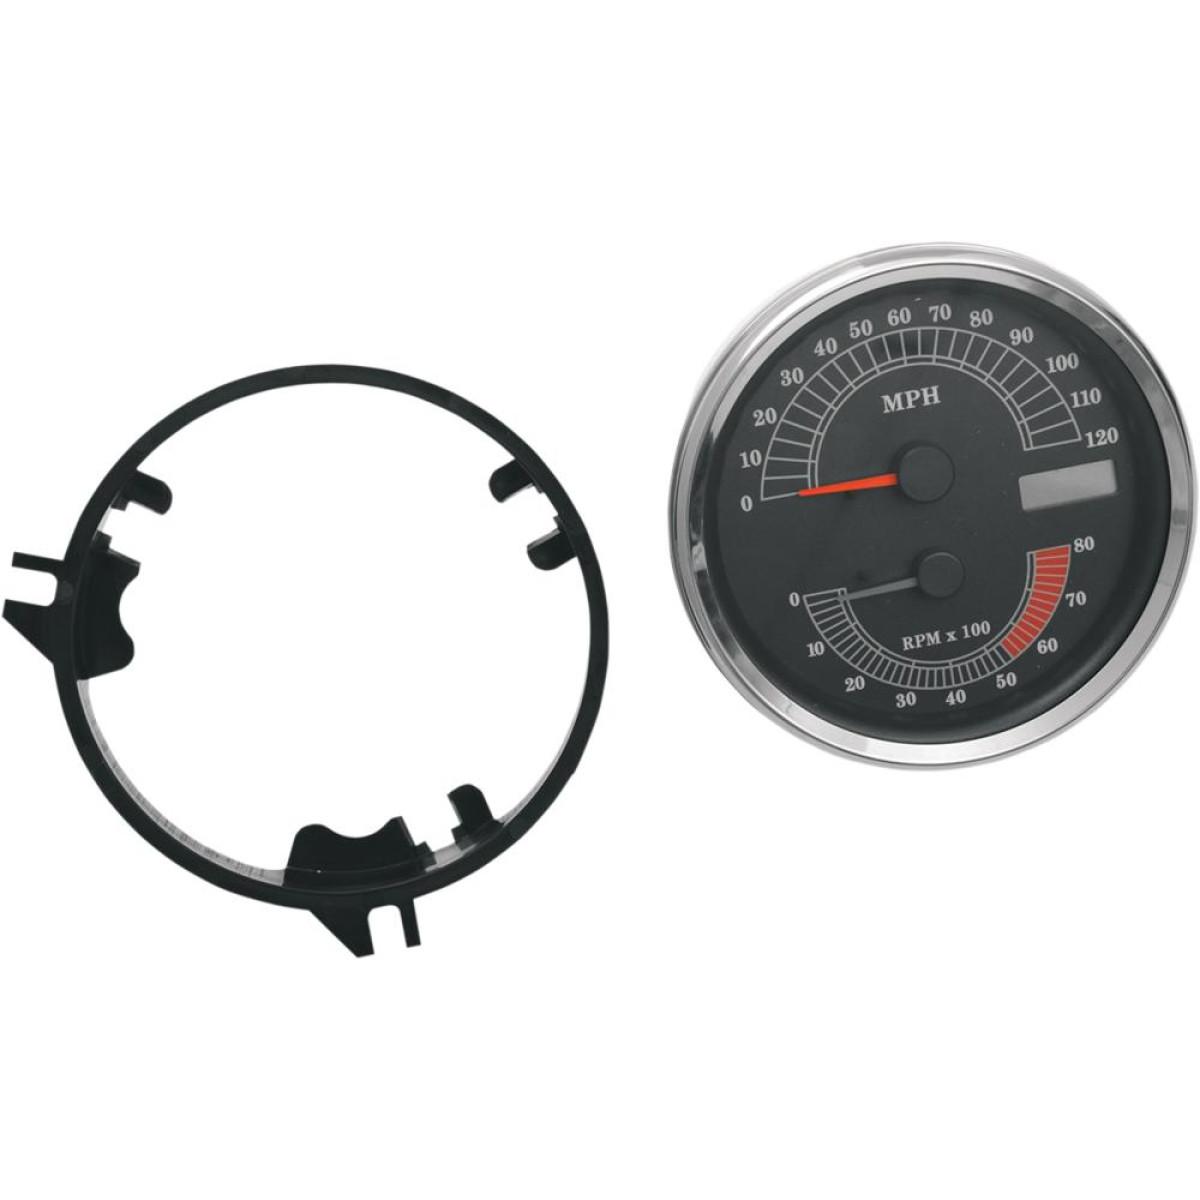 sunpro drag n tach wiring diagram ba falcon stereo specialties speed tachometer 5 inch 120mph 8000rpm